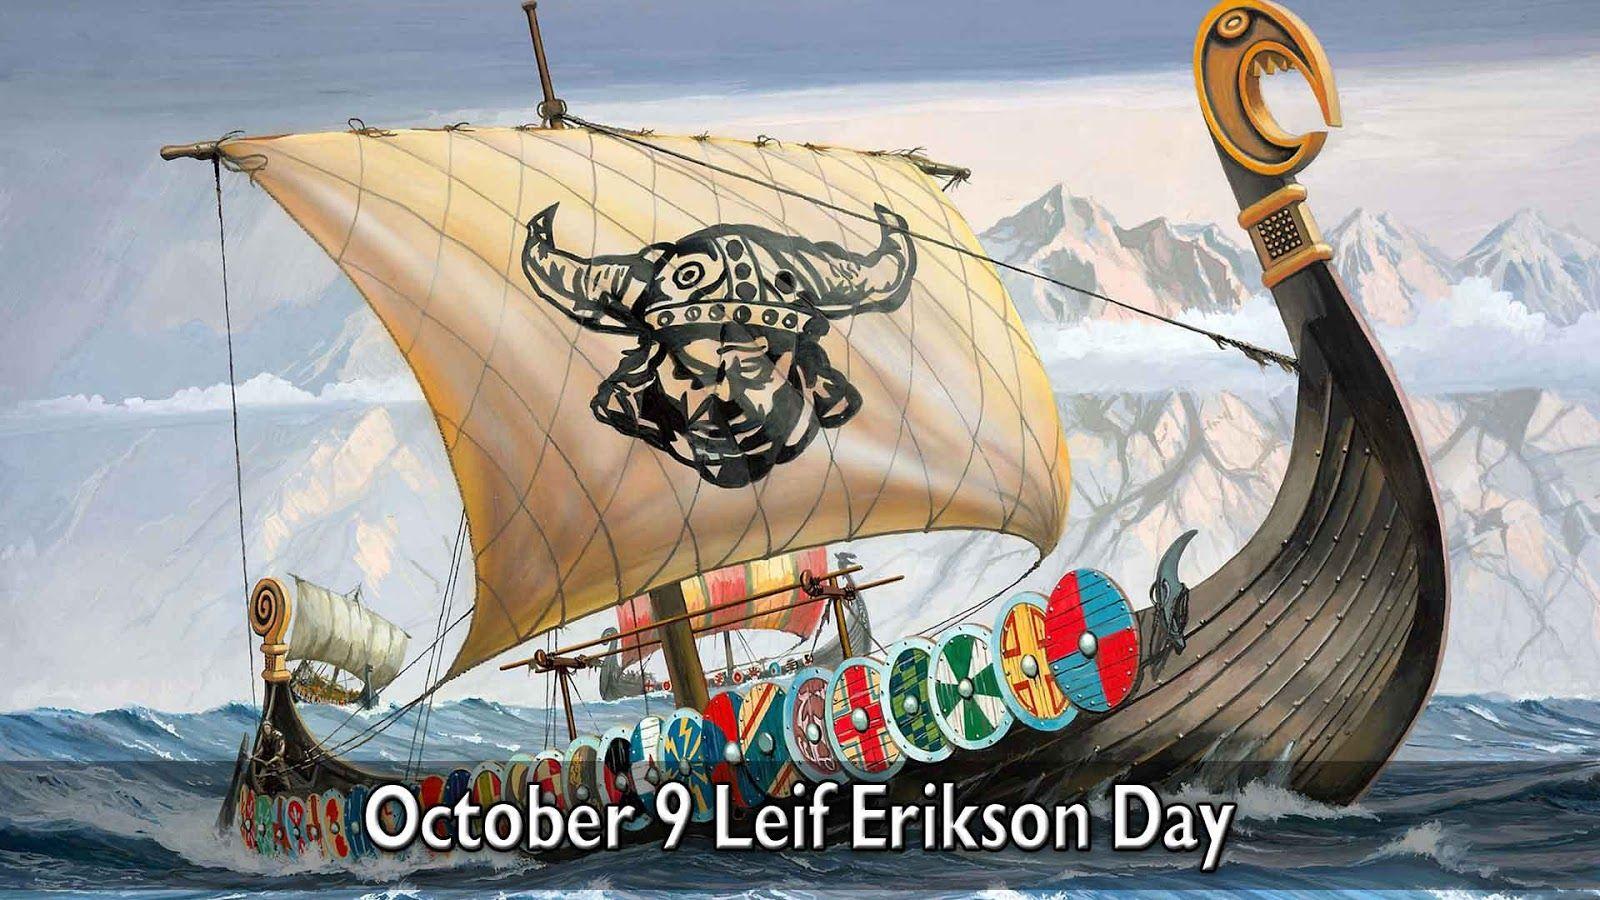 October 9 Leif Erikson Day